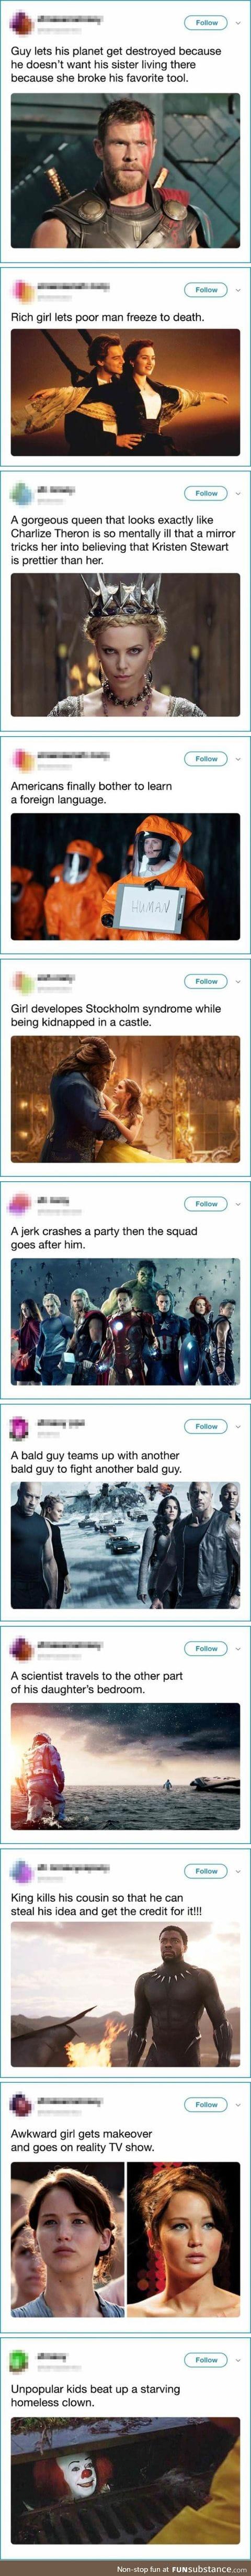 Movie plots